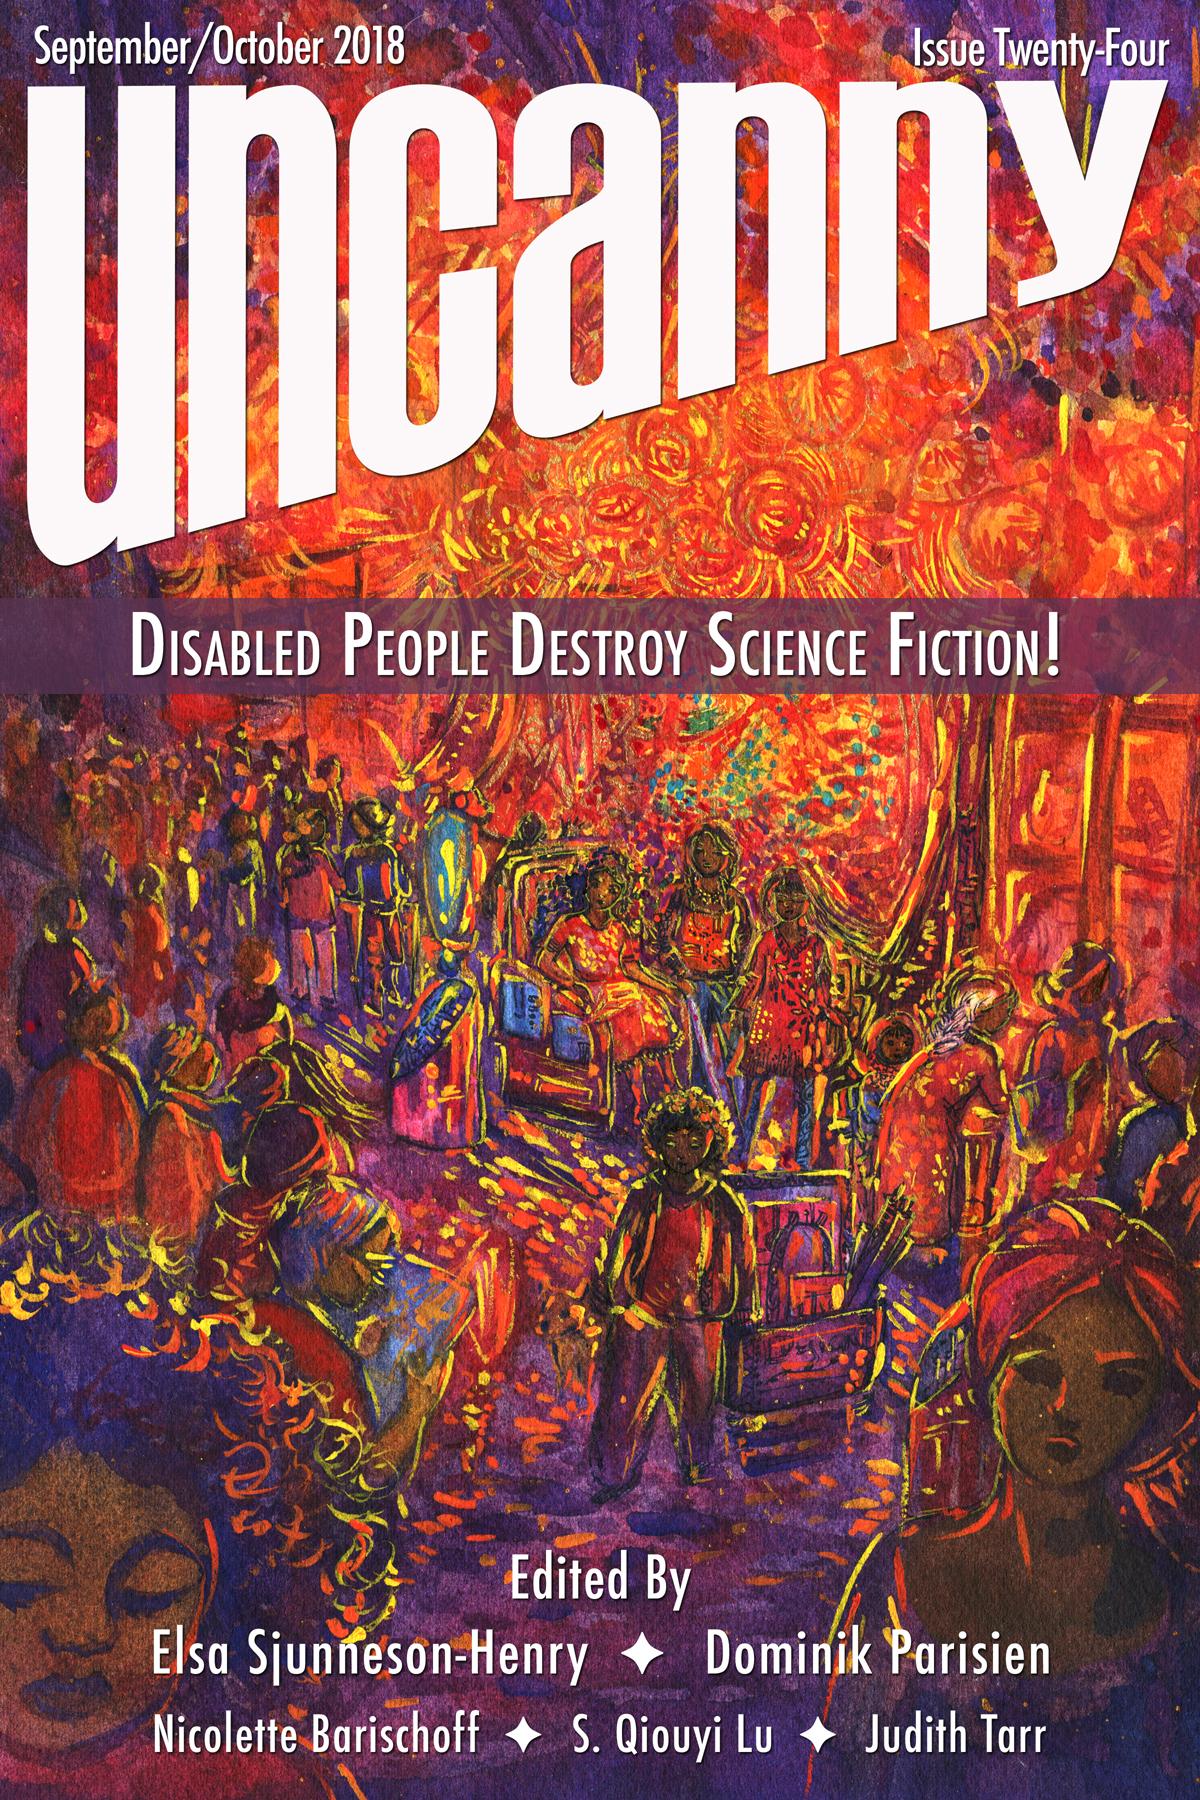 Uncanny Magazine Issue 24: Disabled People Destroy Science Fiction! Special Issue by S. Qiouyi Lu, Dominik Parisien, Judith Tarr, Elsa Sjunneson-Henry, Elsa Sjunneson, Nicolette Barischoff